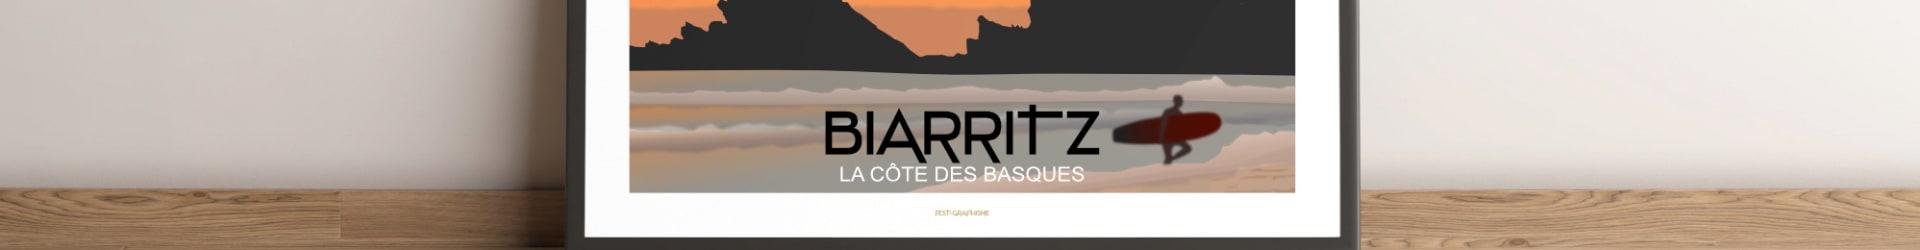 BIARRITZ Côte des Basques – Horizontal